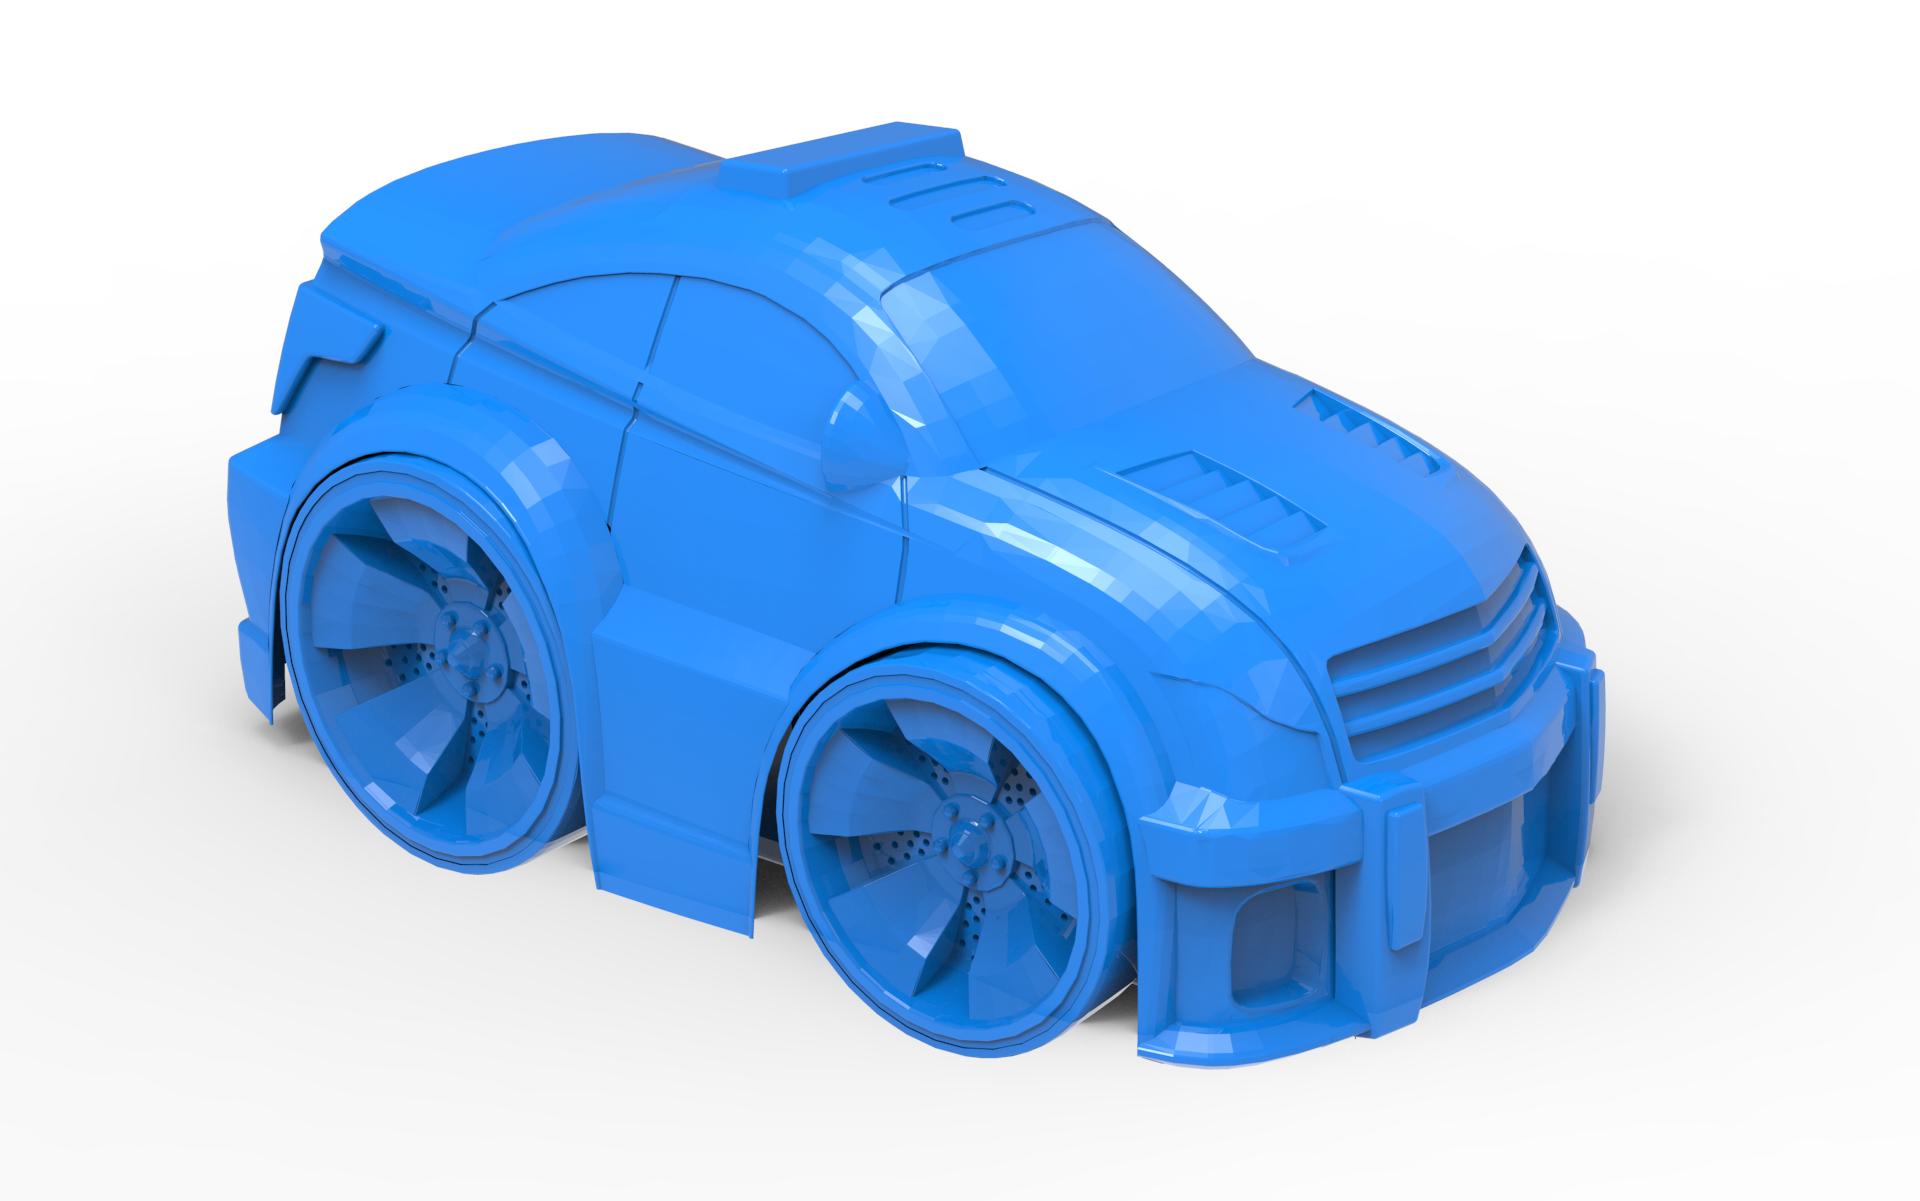 untitled.1570.png Download free STL file Police car • 3D printer design, hcchong